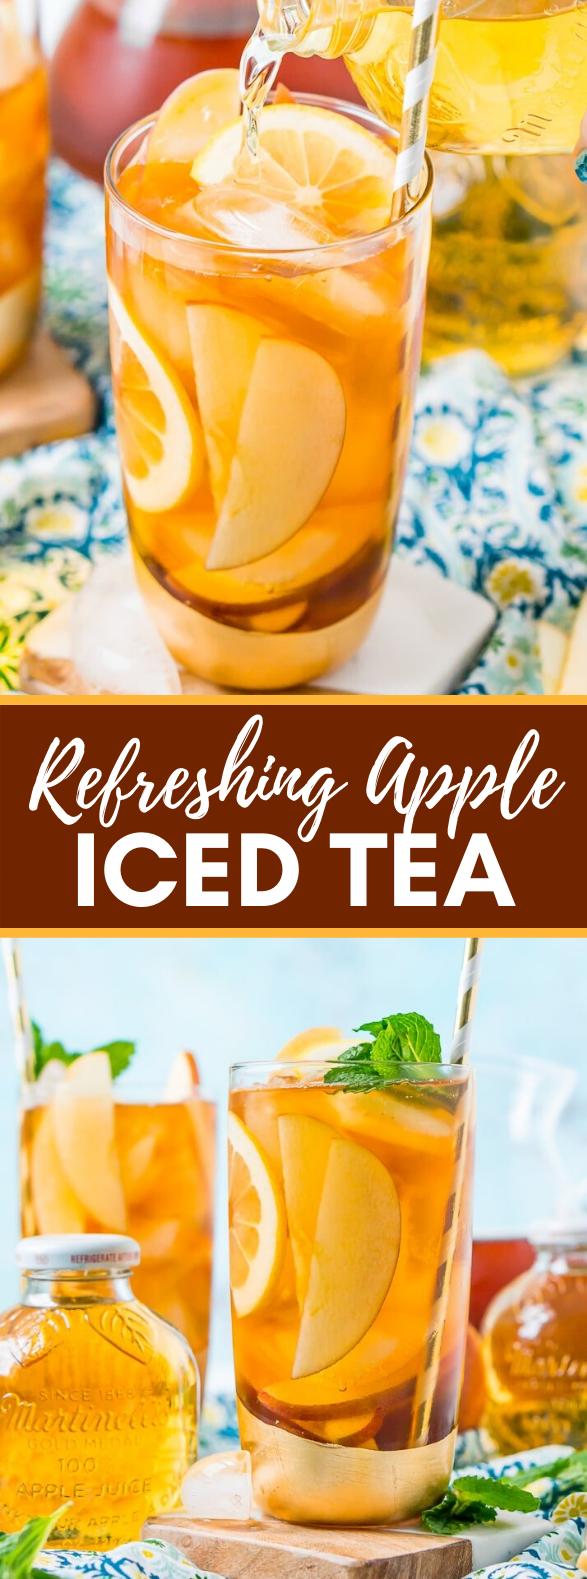 Apple Iced Tea #drinks #summerdrink #icedtea #fruit #freshdrink